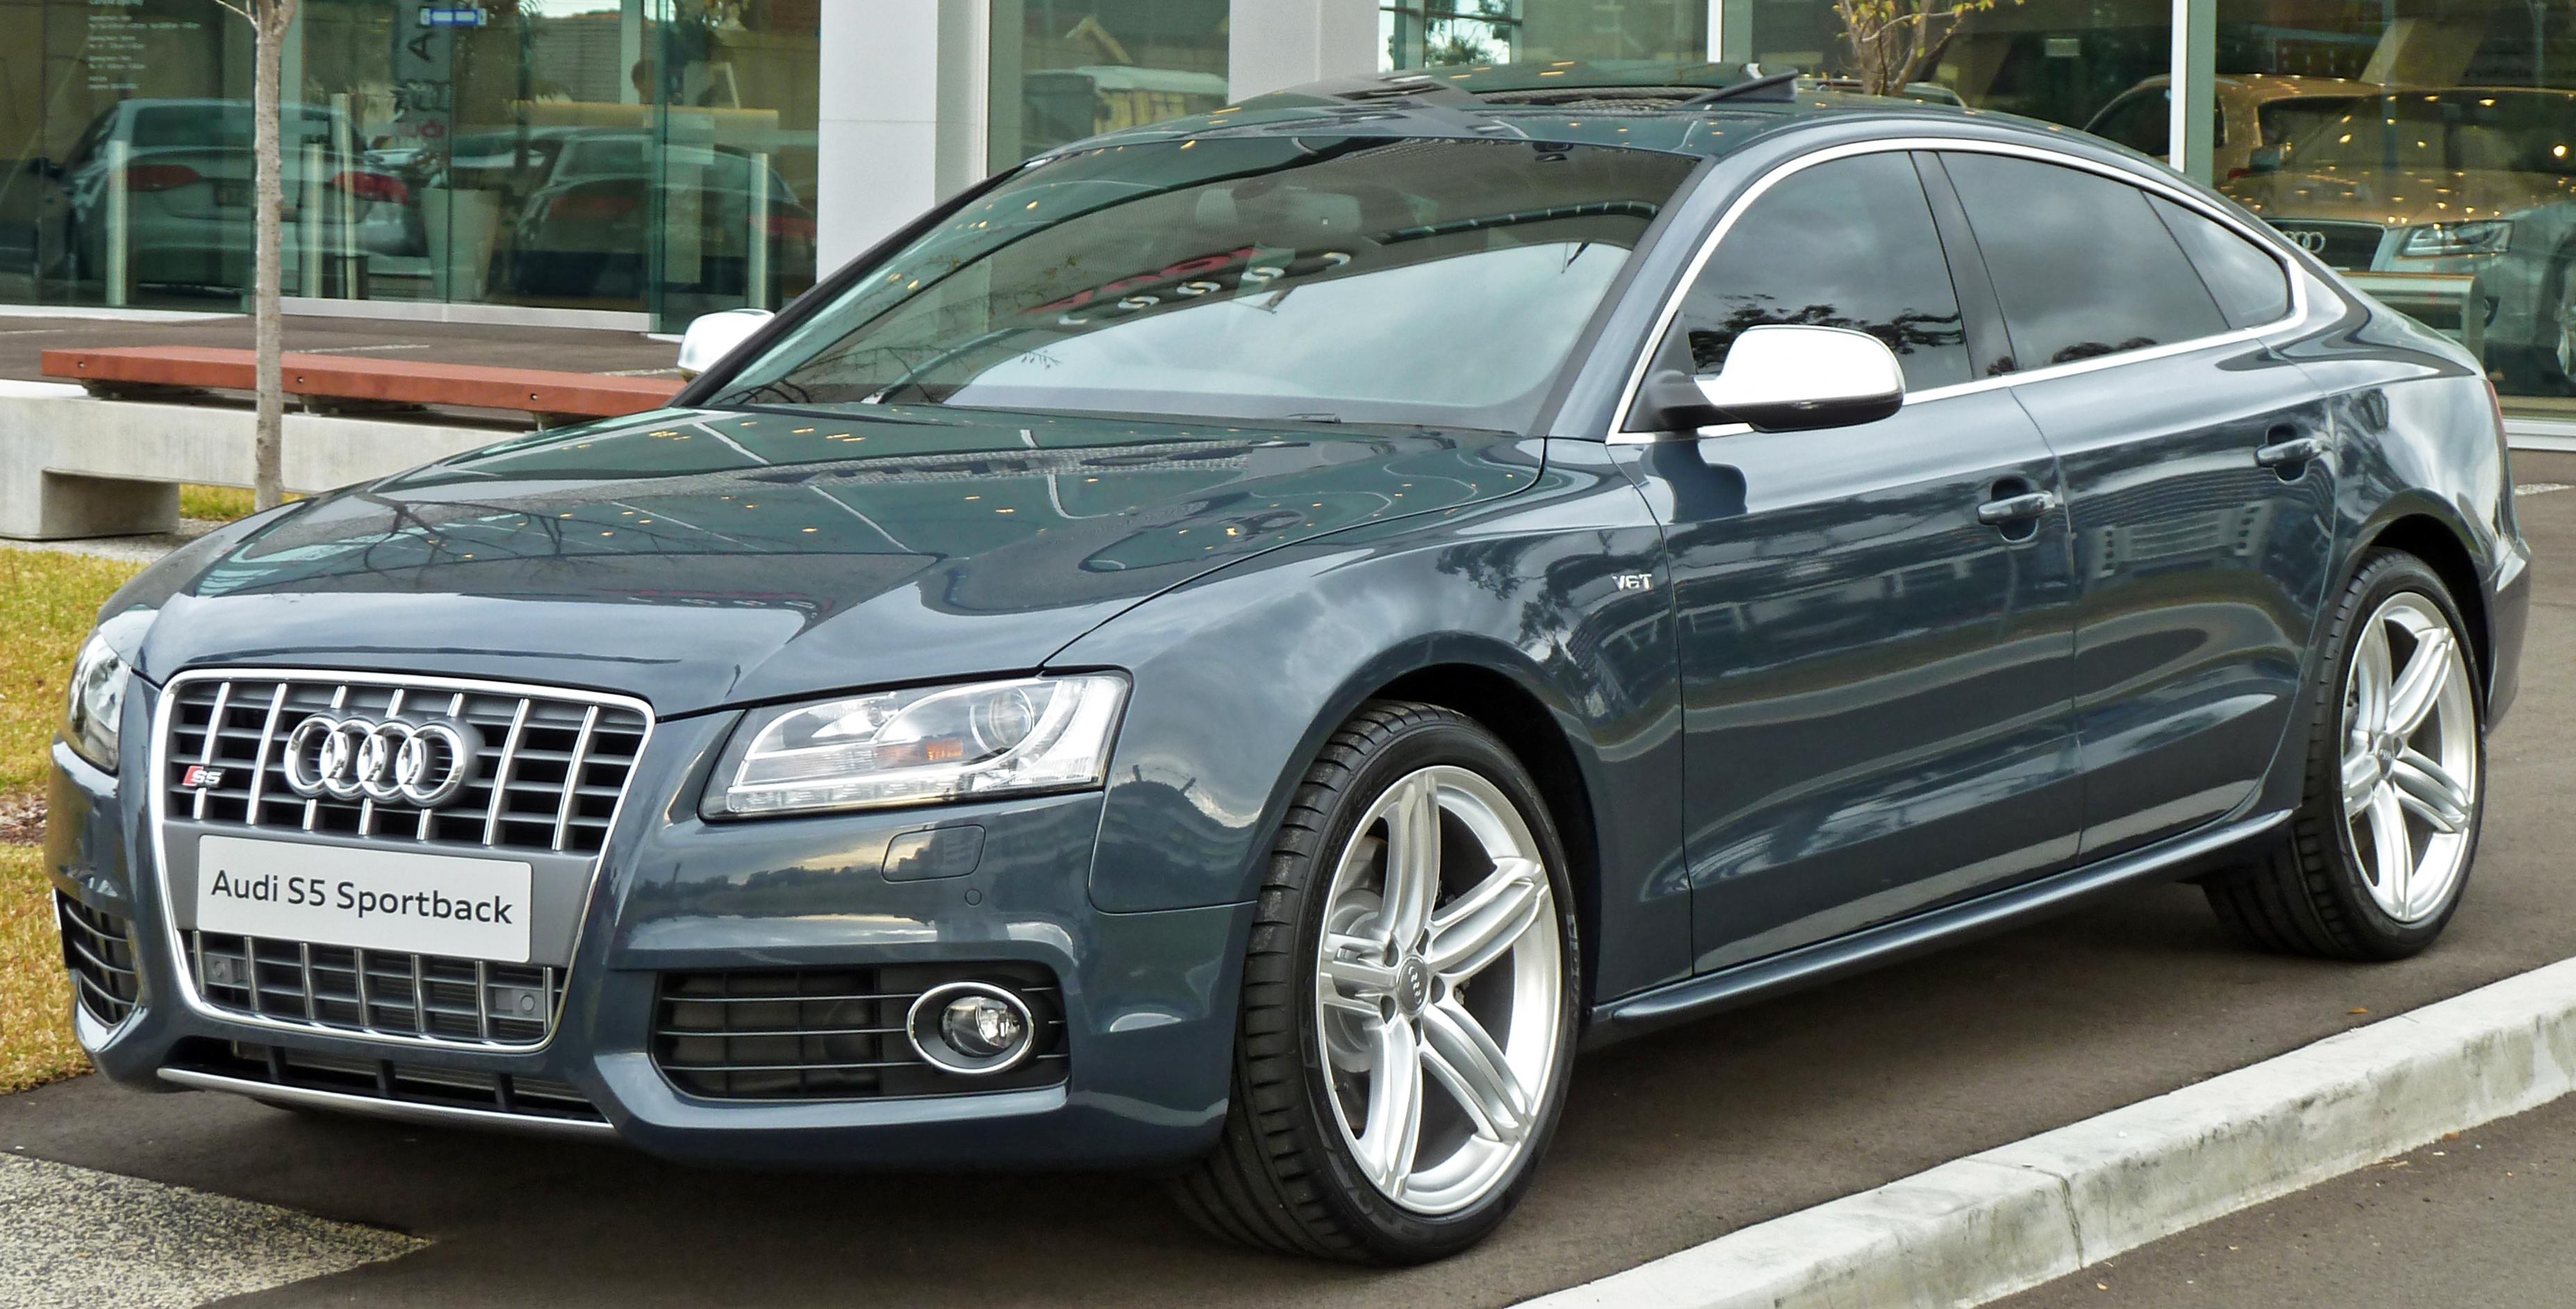 2010 Audi S5 Image 12